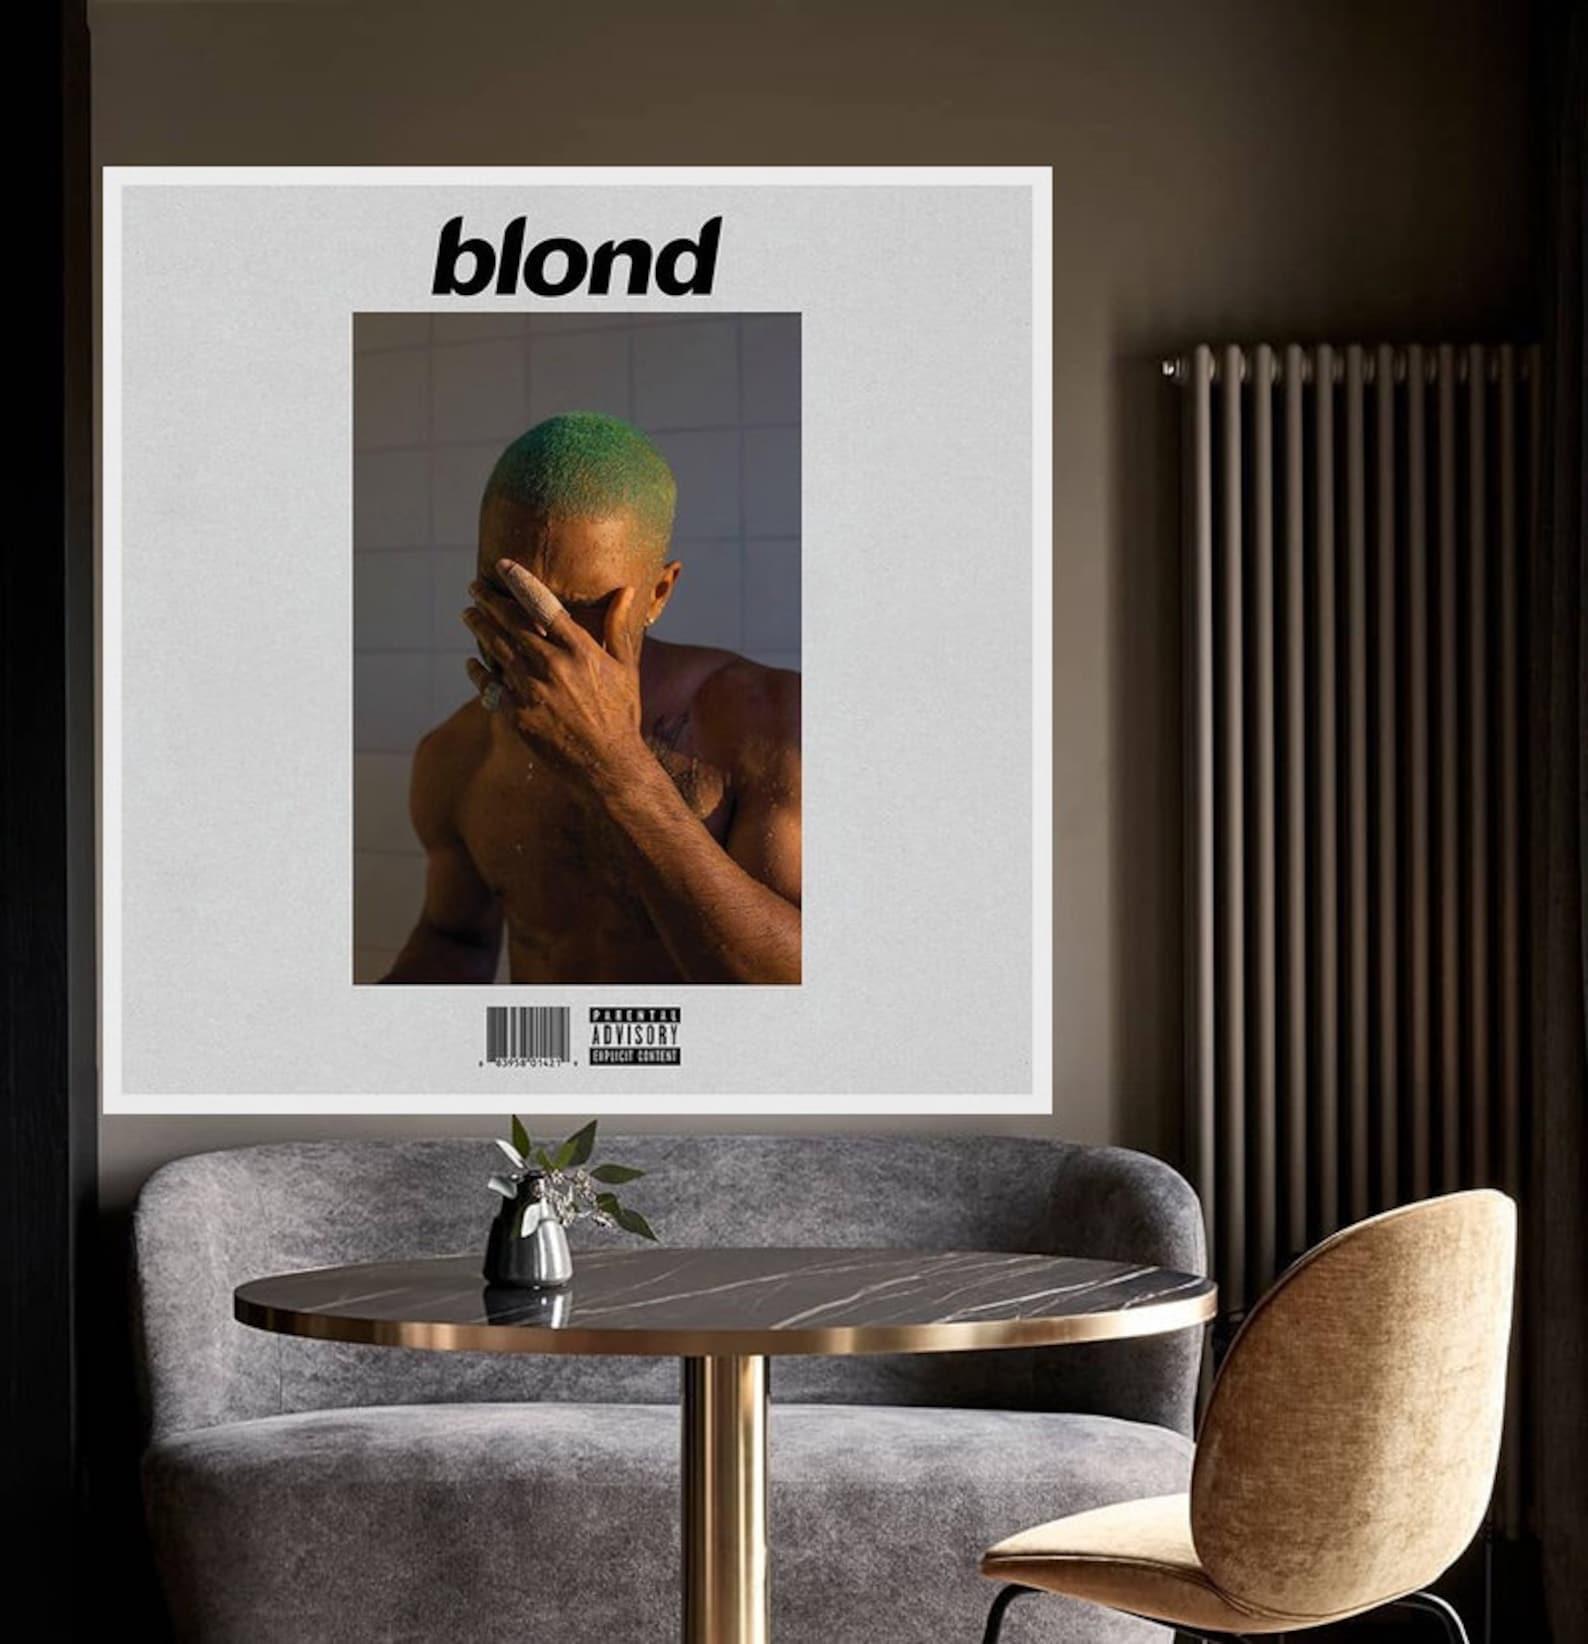 Frank ocean blonde album cover music Fancier Audiophile